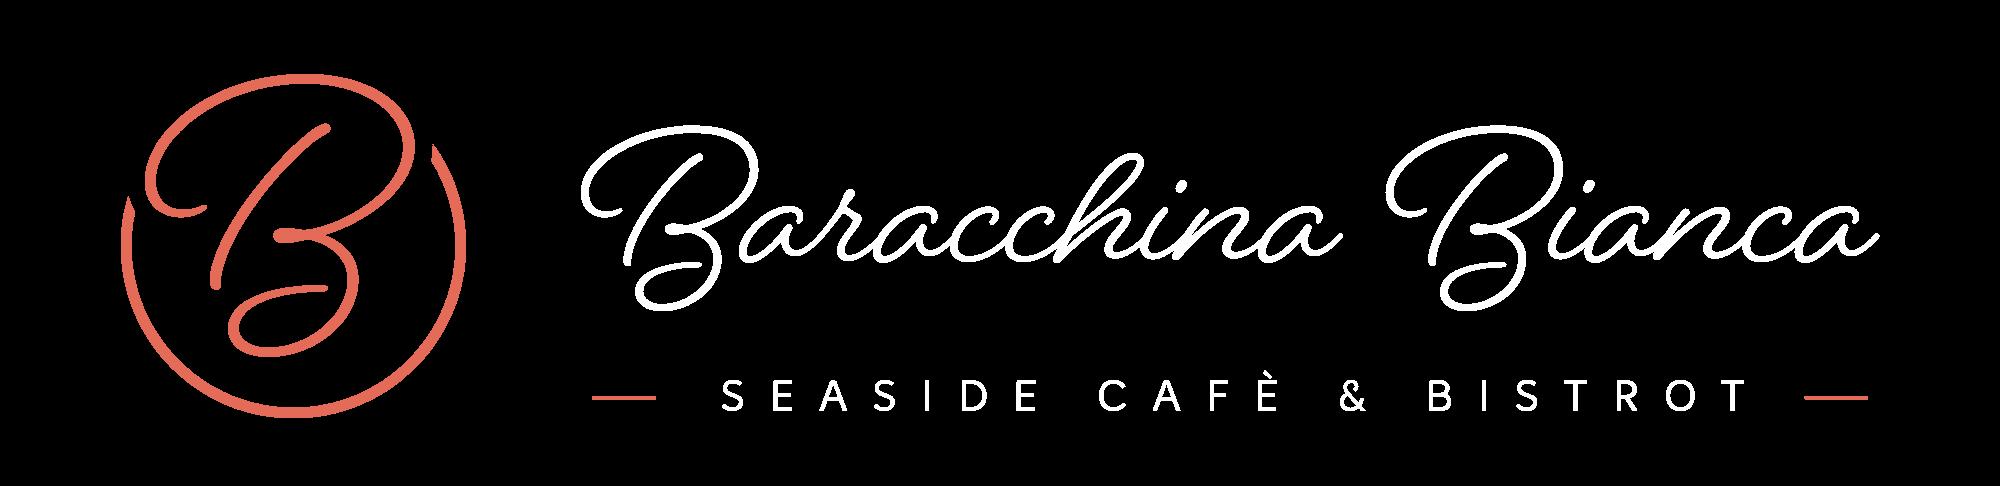 Baracchina Bianca Pasticceria